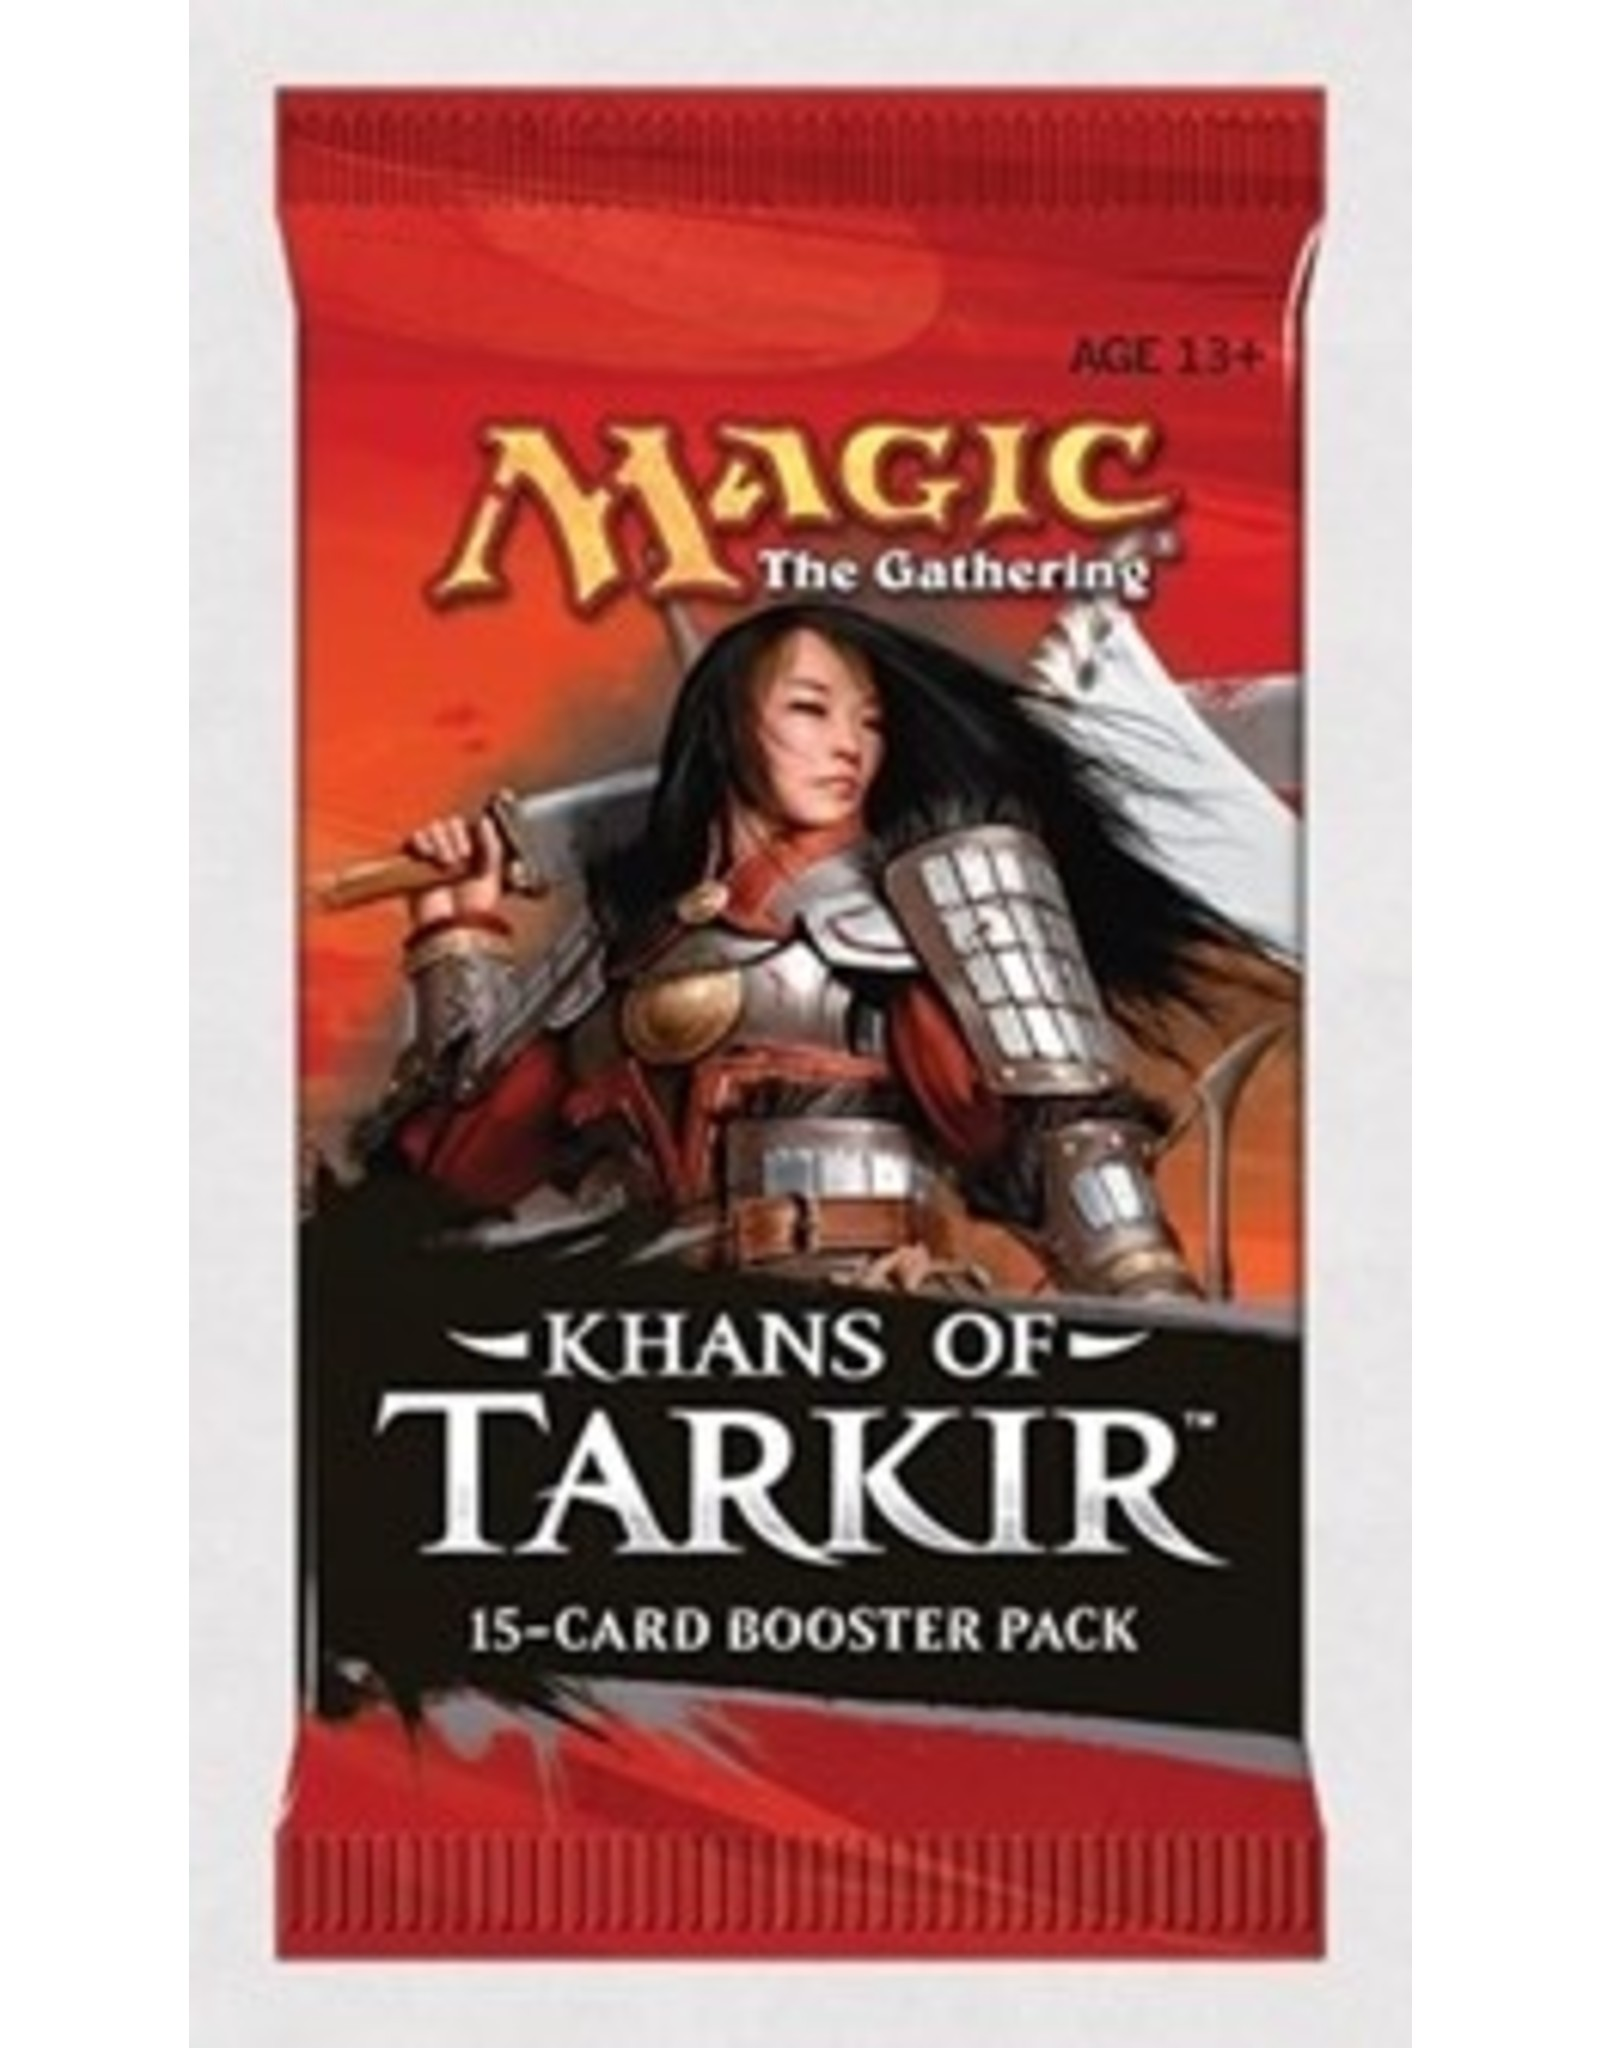 Magic Magic the Gathering: Khans of Tarkir Booster Pack